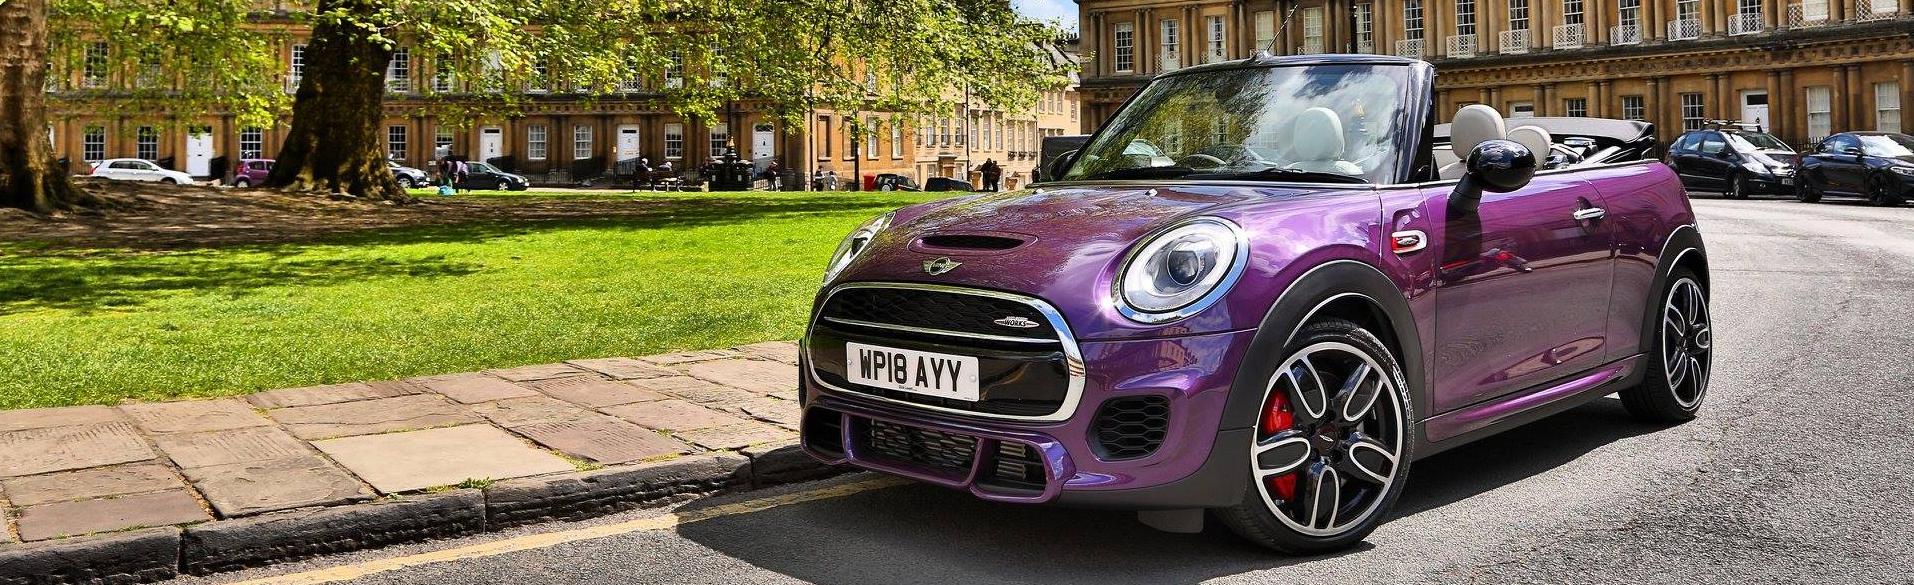 MINI Purple Silk Parked